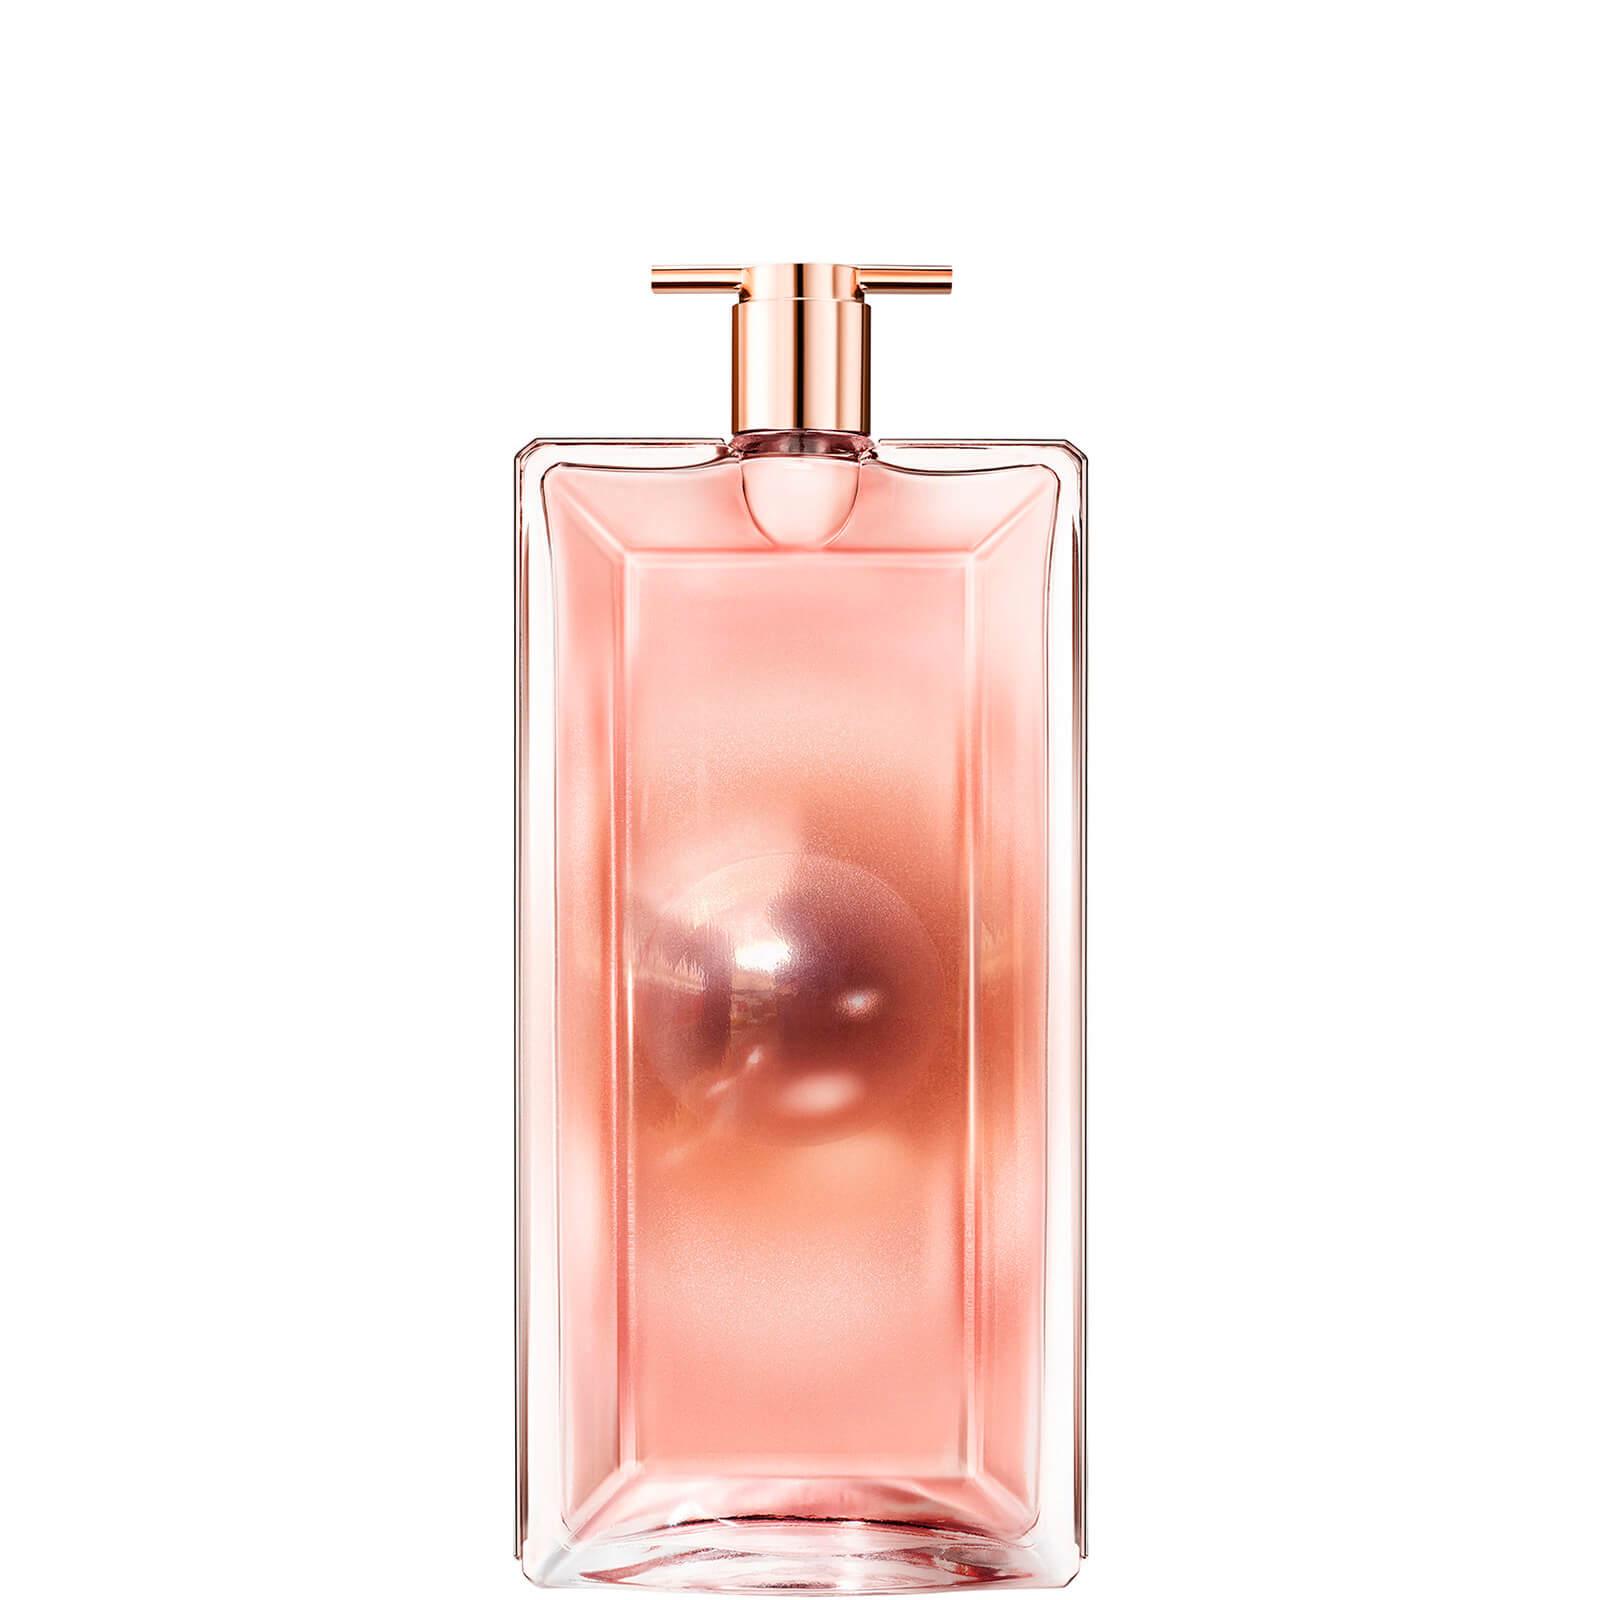 Купить Lancôme Idole Aura Eau De Parfum Fragrance (Various Sizes) - 100ml